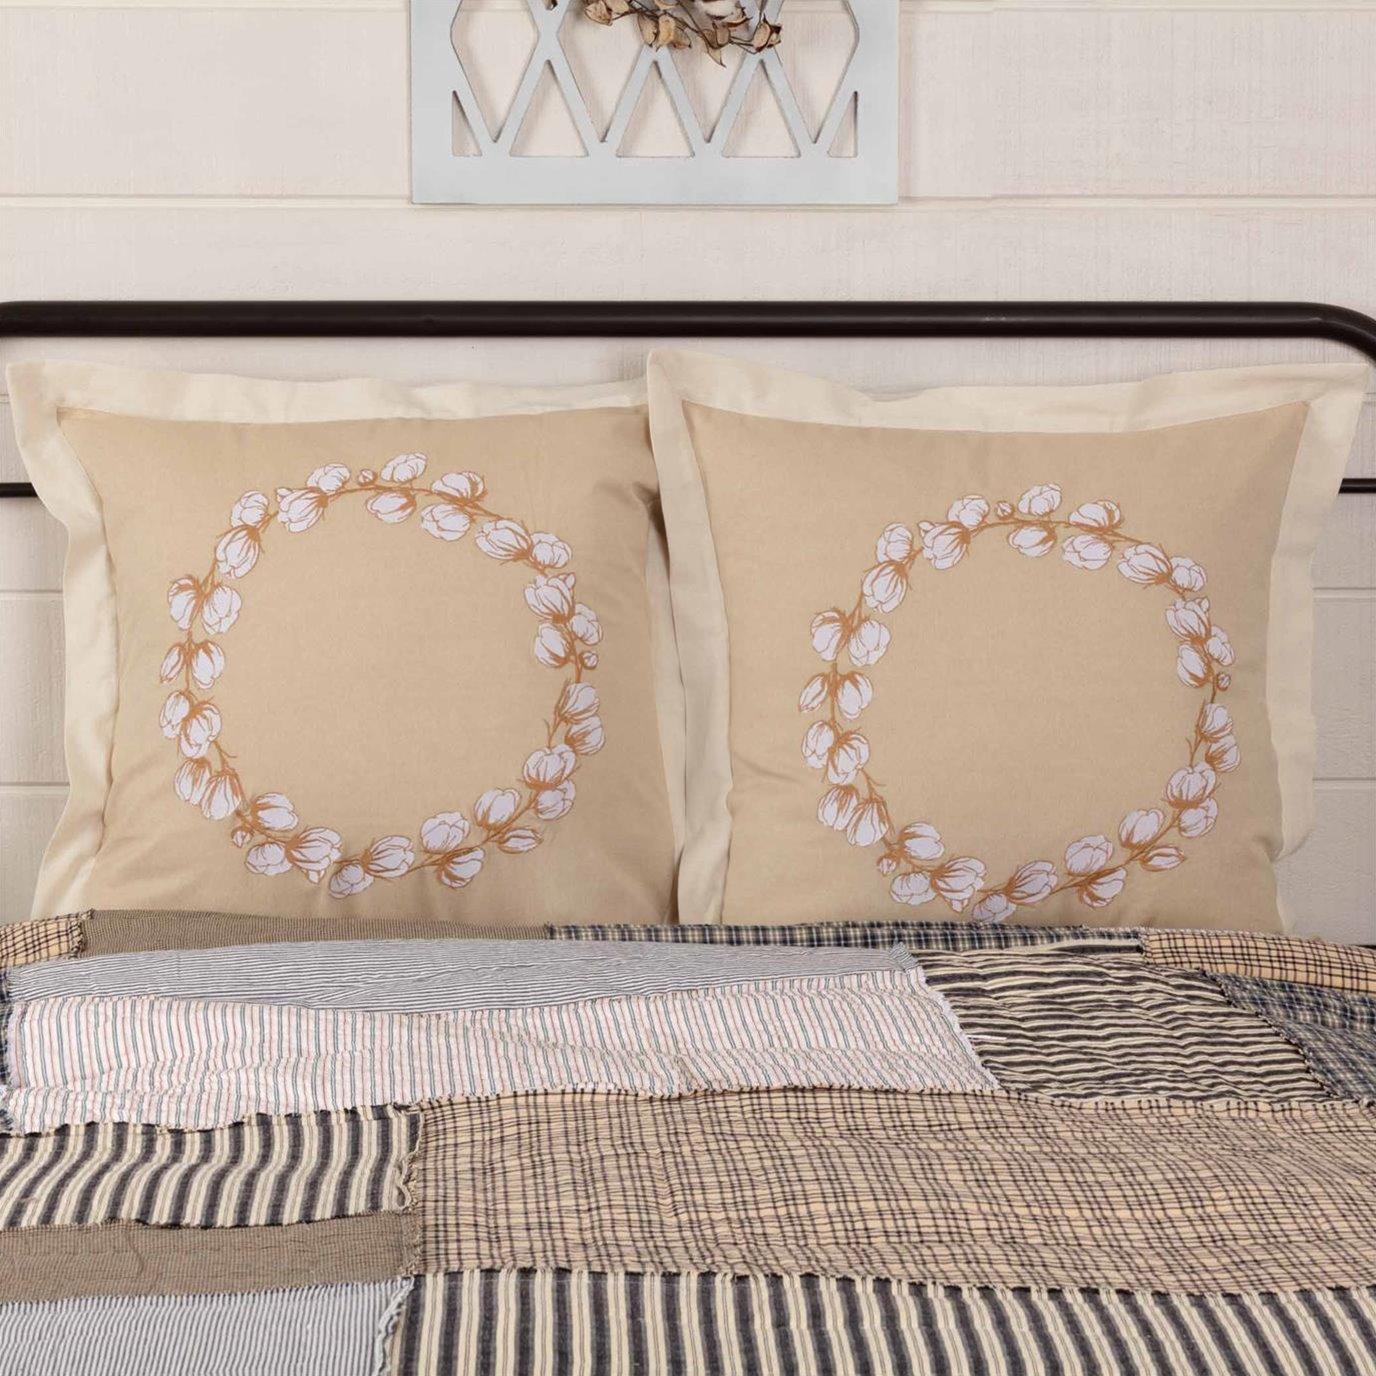 Ashmont Cotton Wreath Fabric Euro Sham Set of 2 26x26